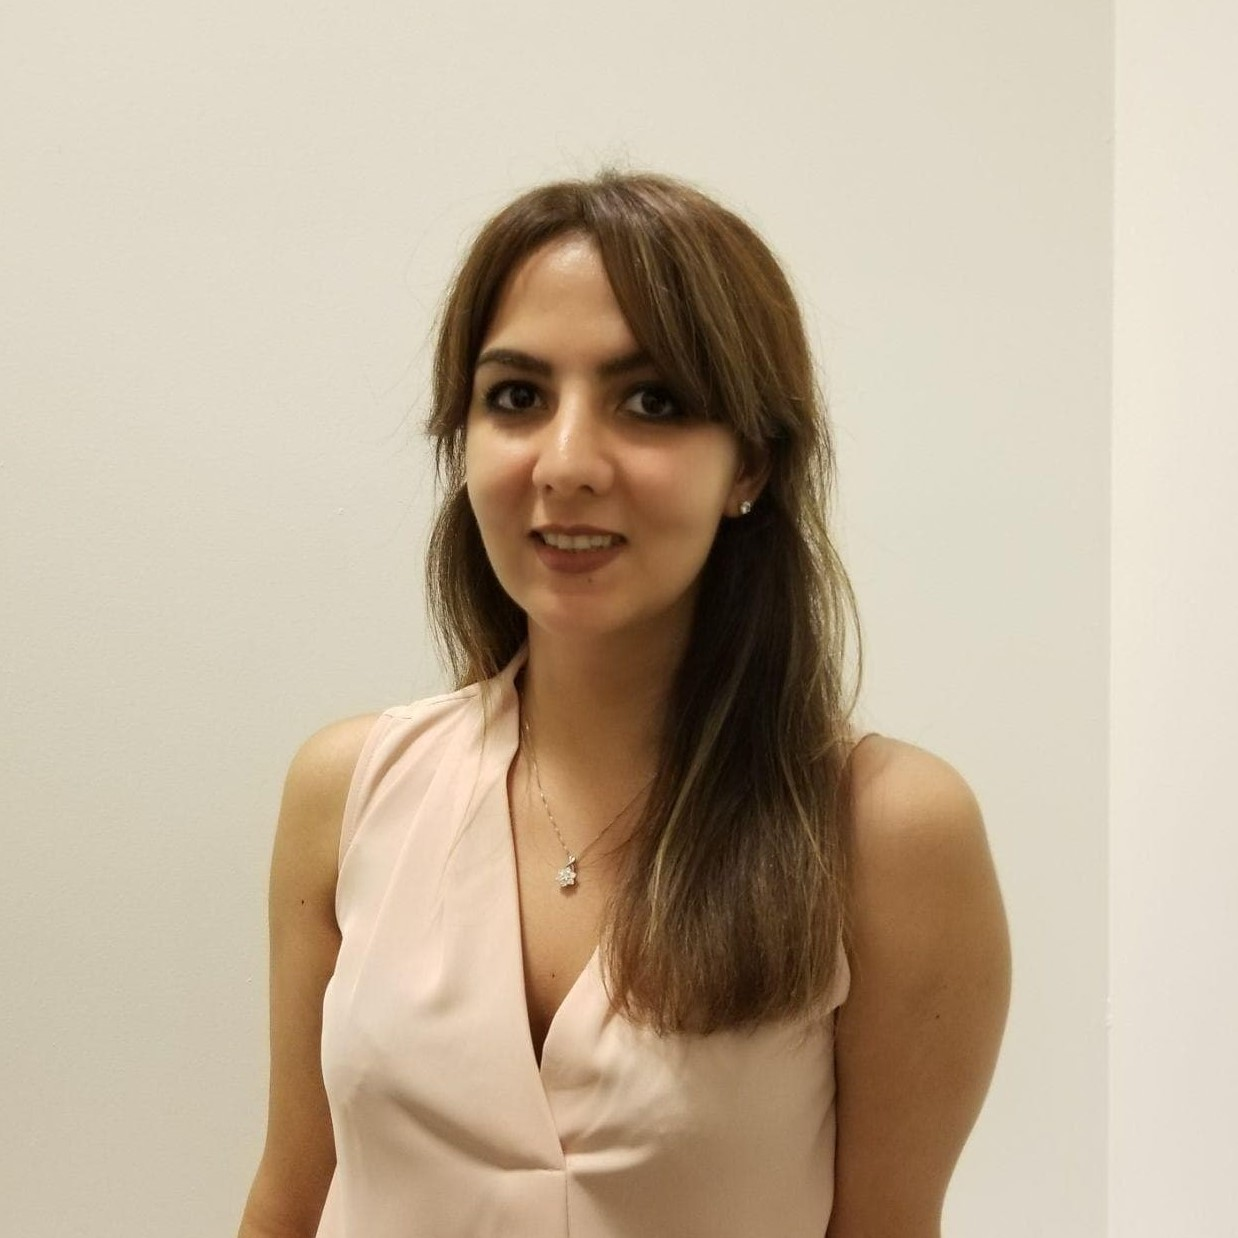 Fatemeh Tavassoli